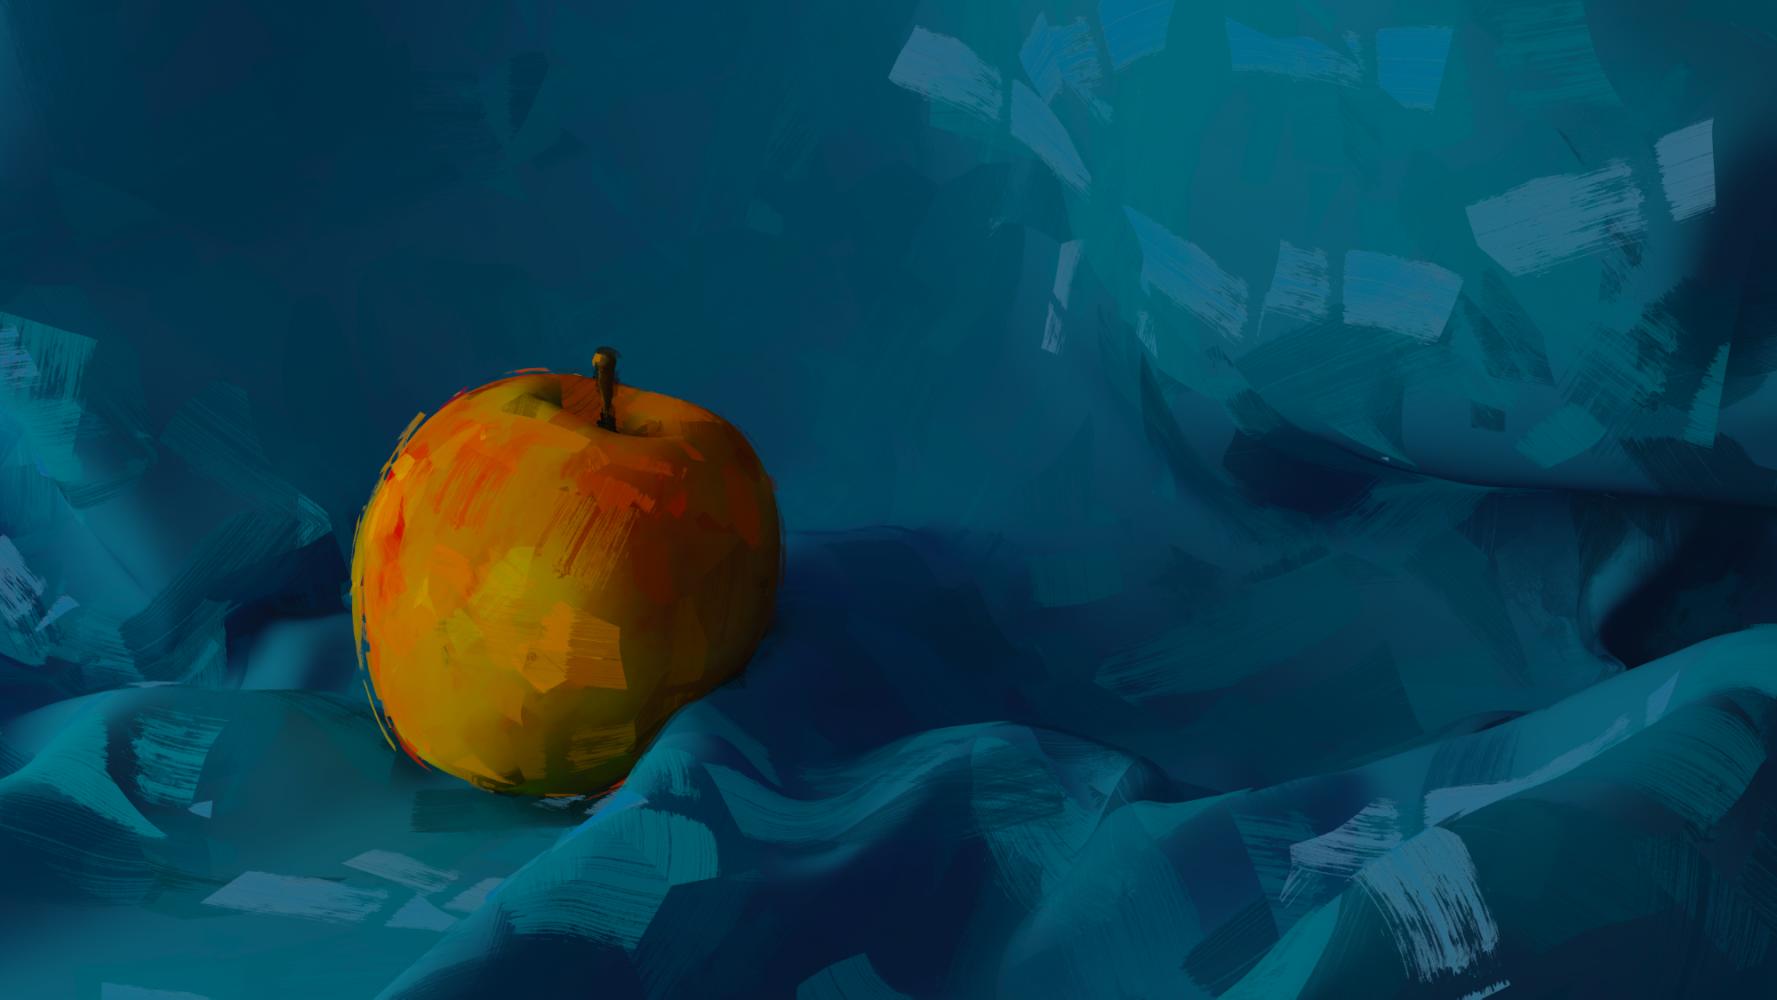 blender illustration shader